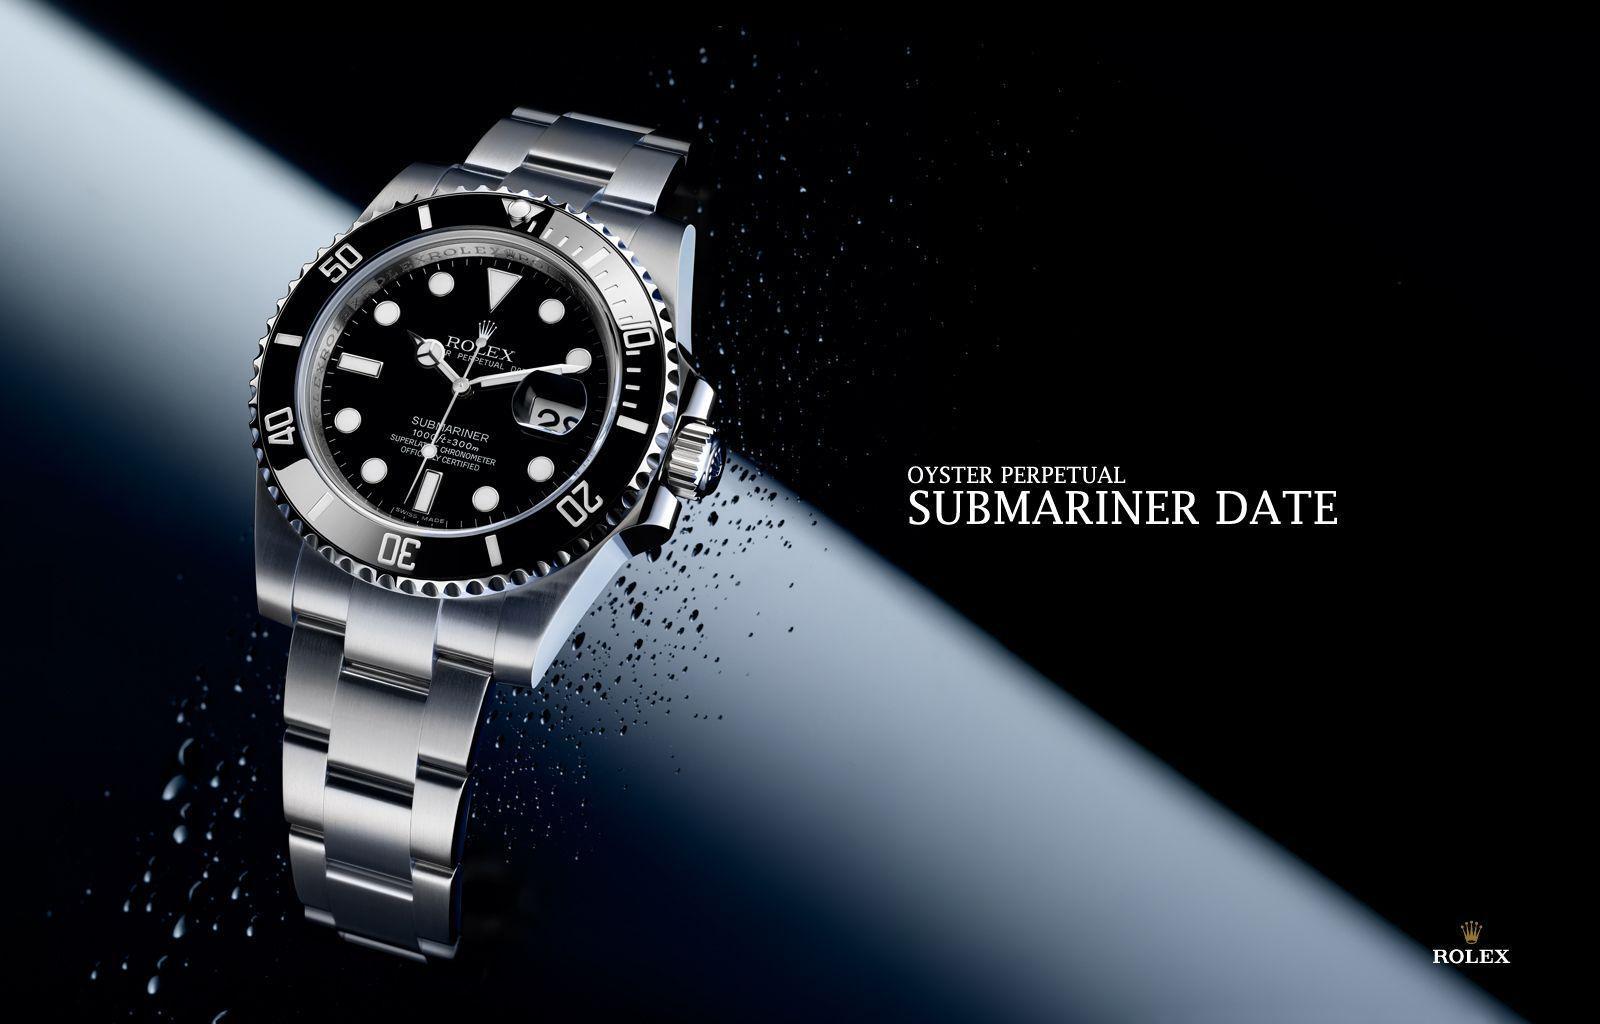 Fantastic Rolex Wallpaper - cr2vb7R HD_45661.jpg